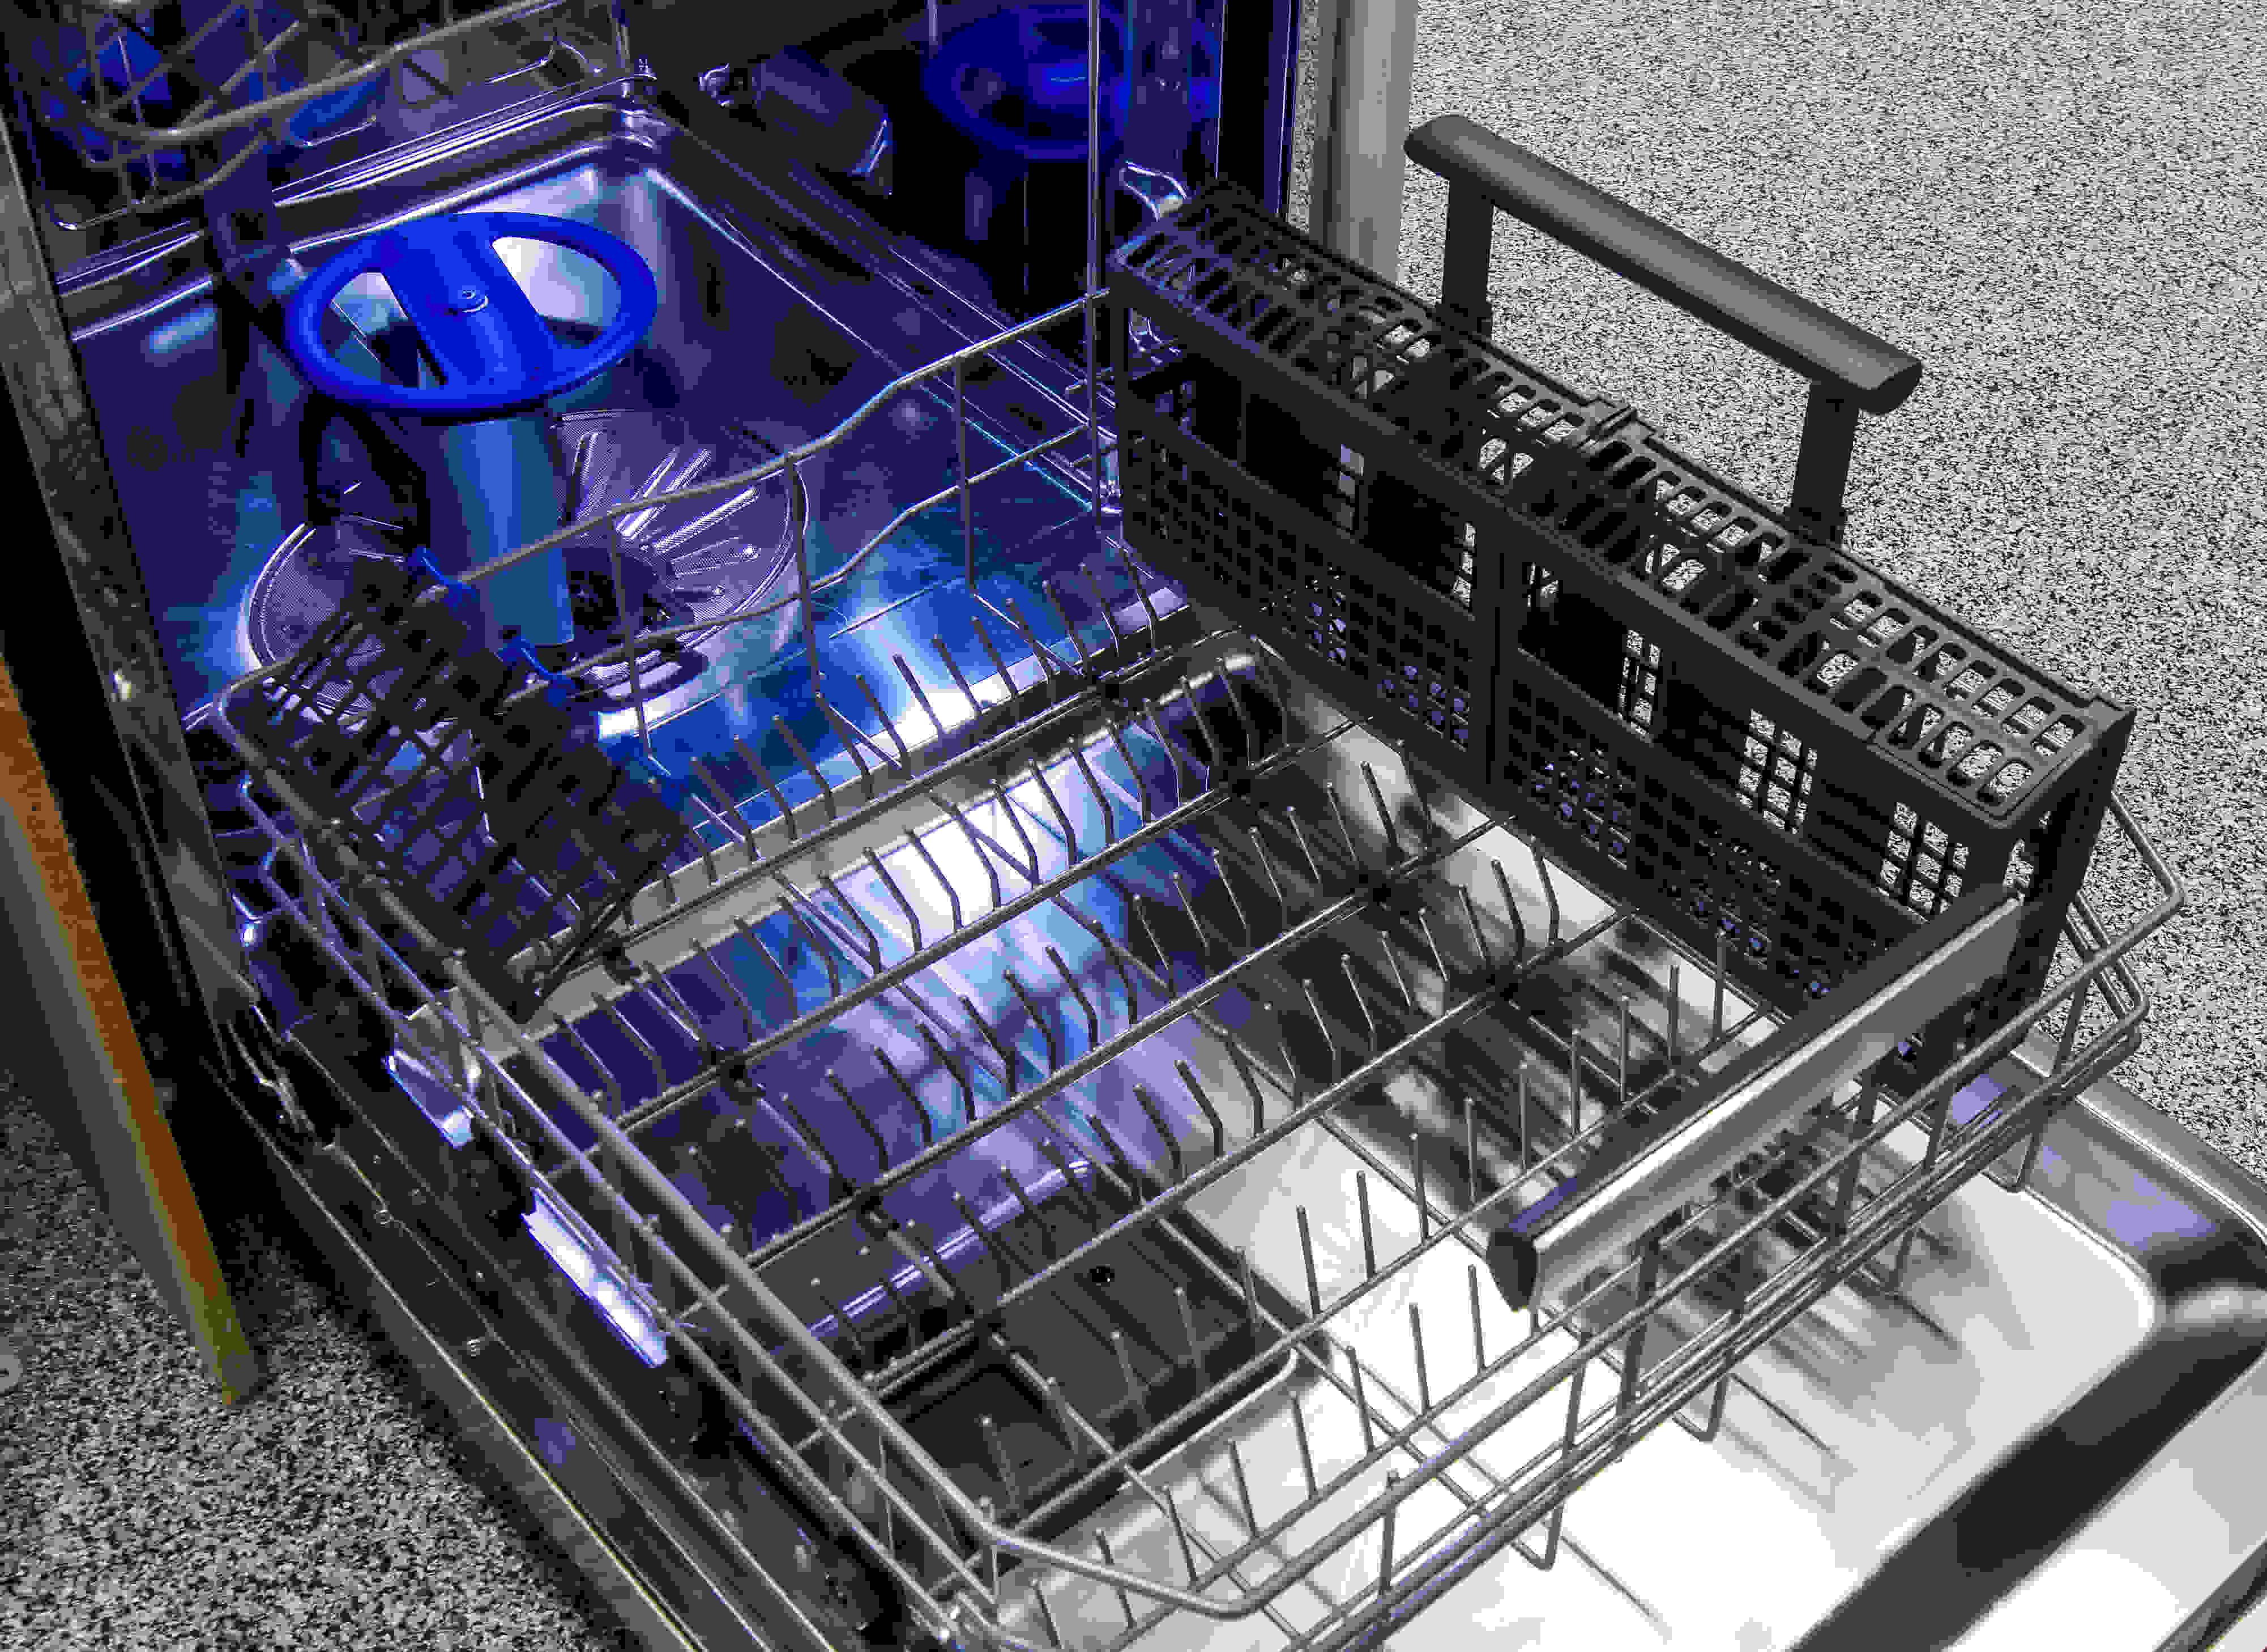 Electrolux EI24ID50QS bottom rack